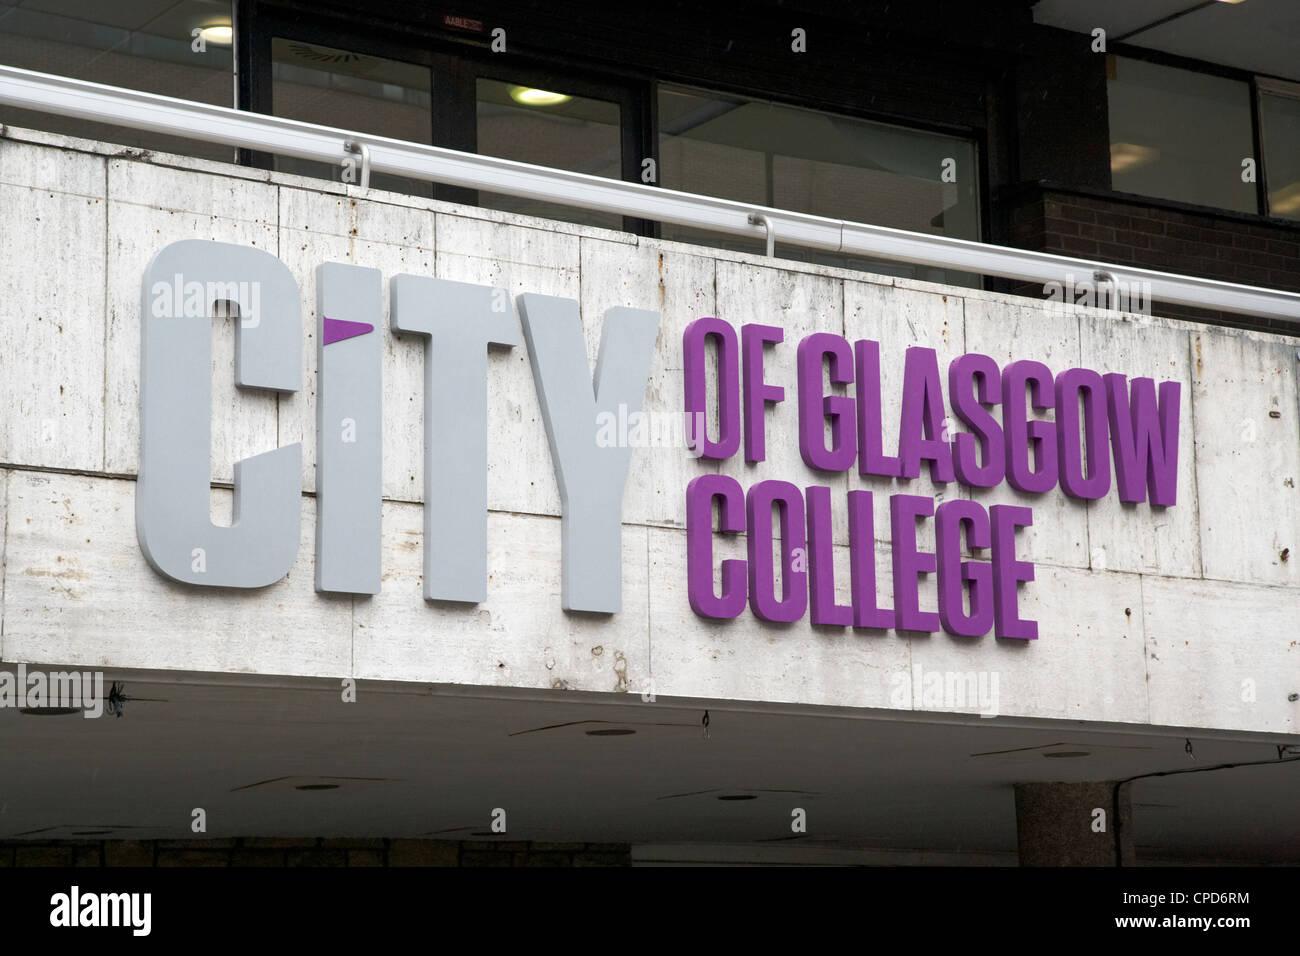 logo for city of glasgow college Glasgow Scotland UK - Stock Image